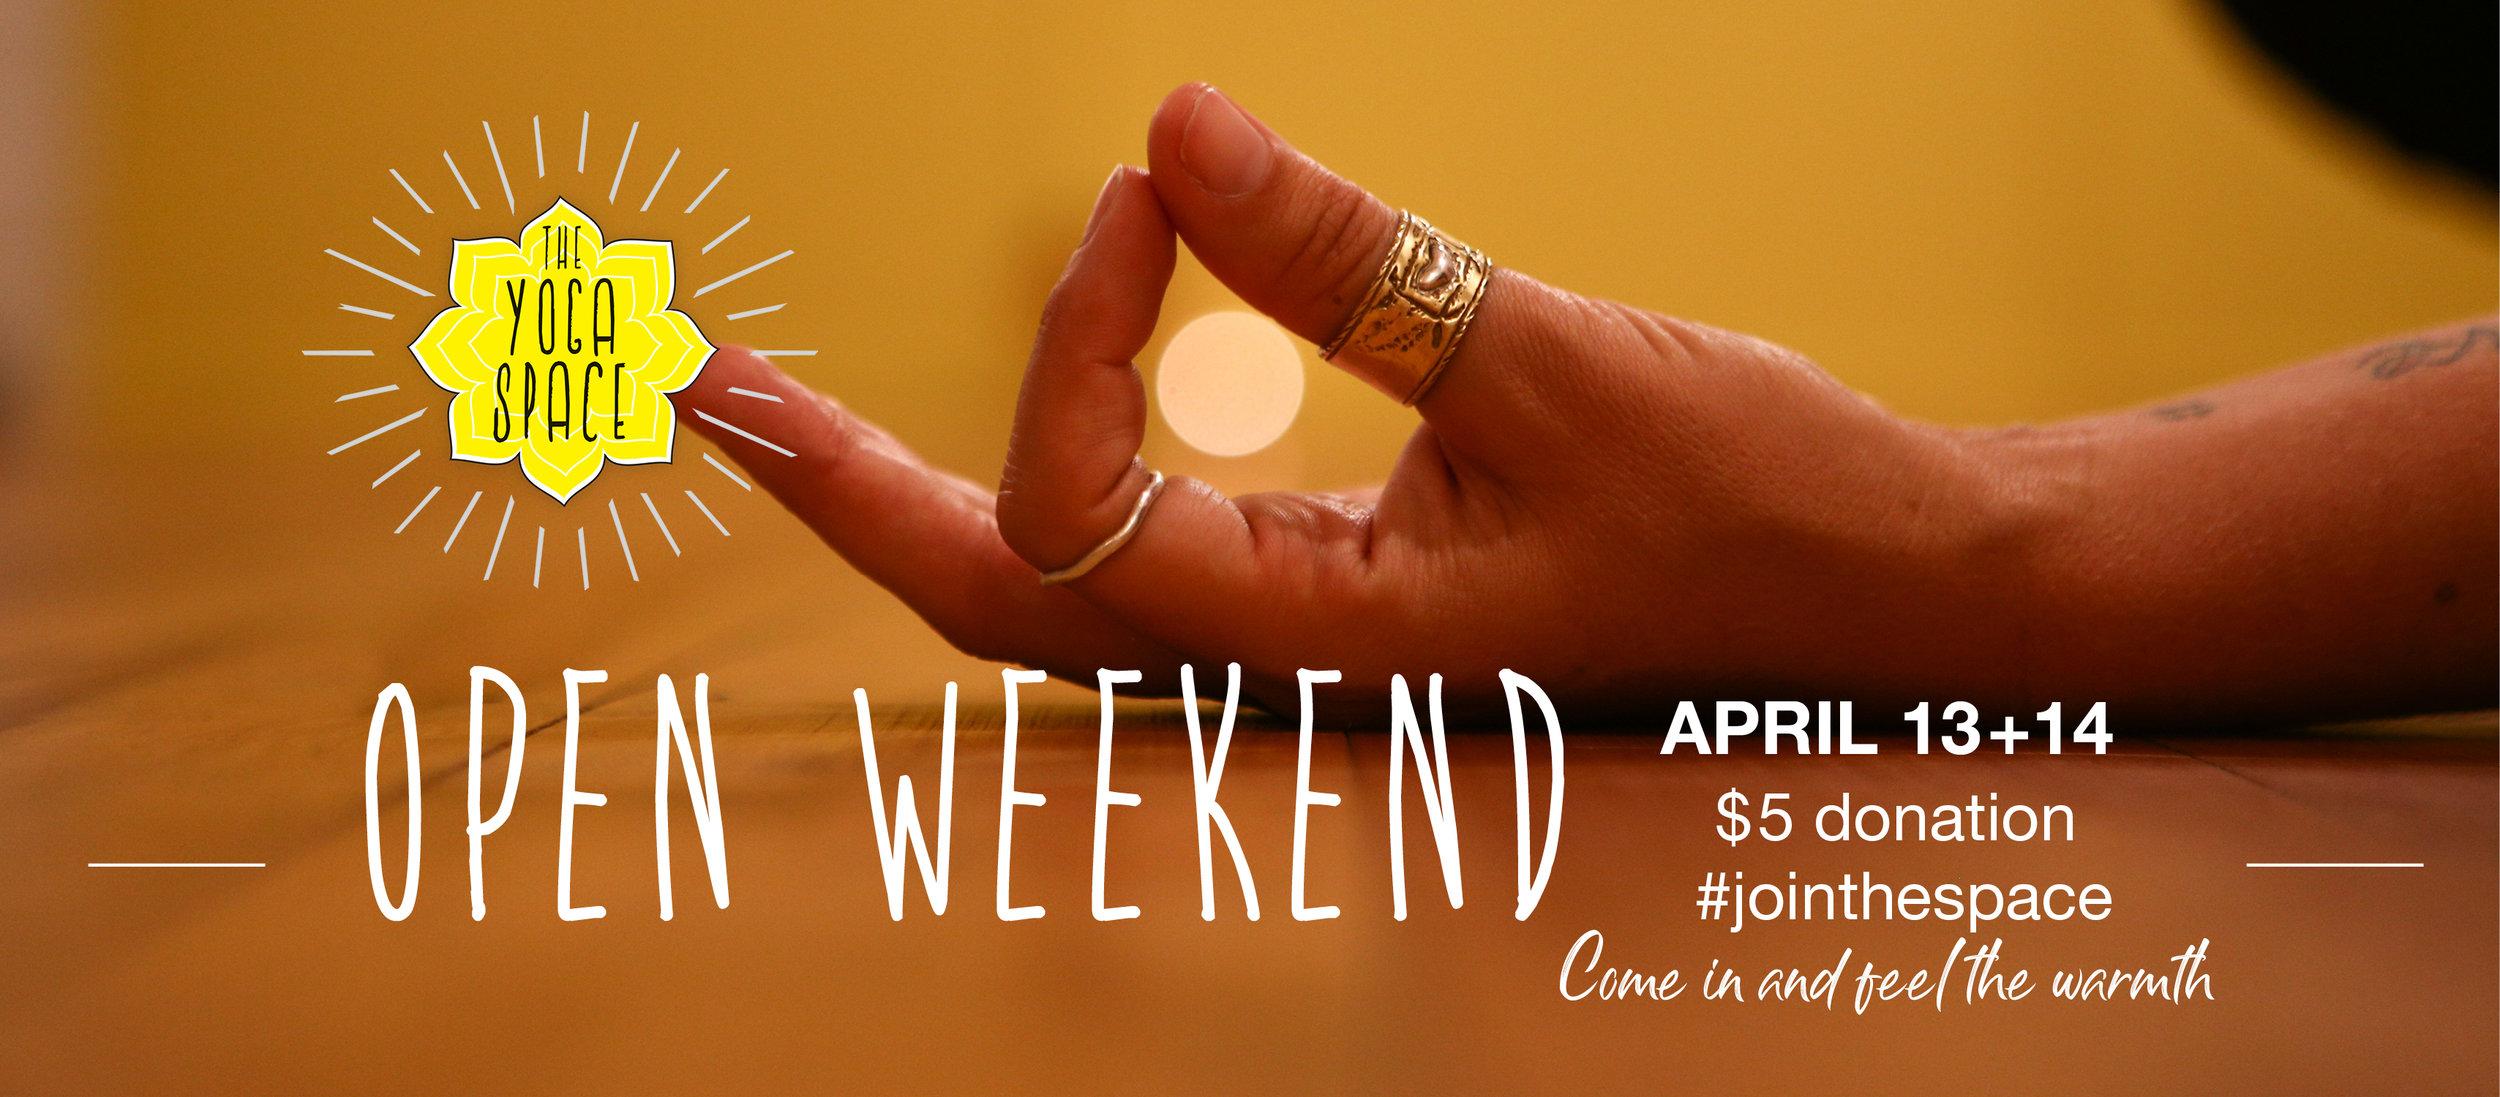 Open Weekend 19 FB Cover.jpg